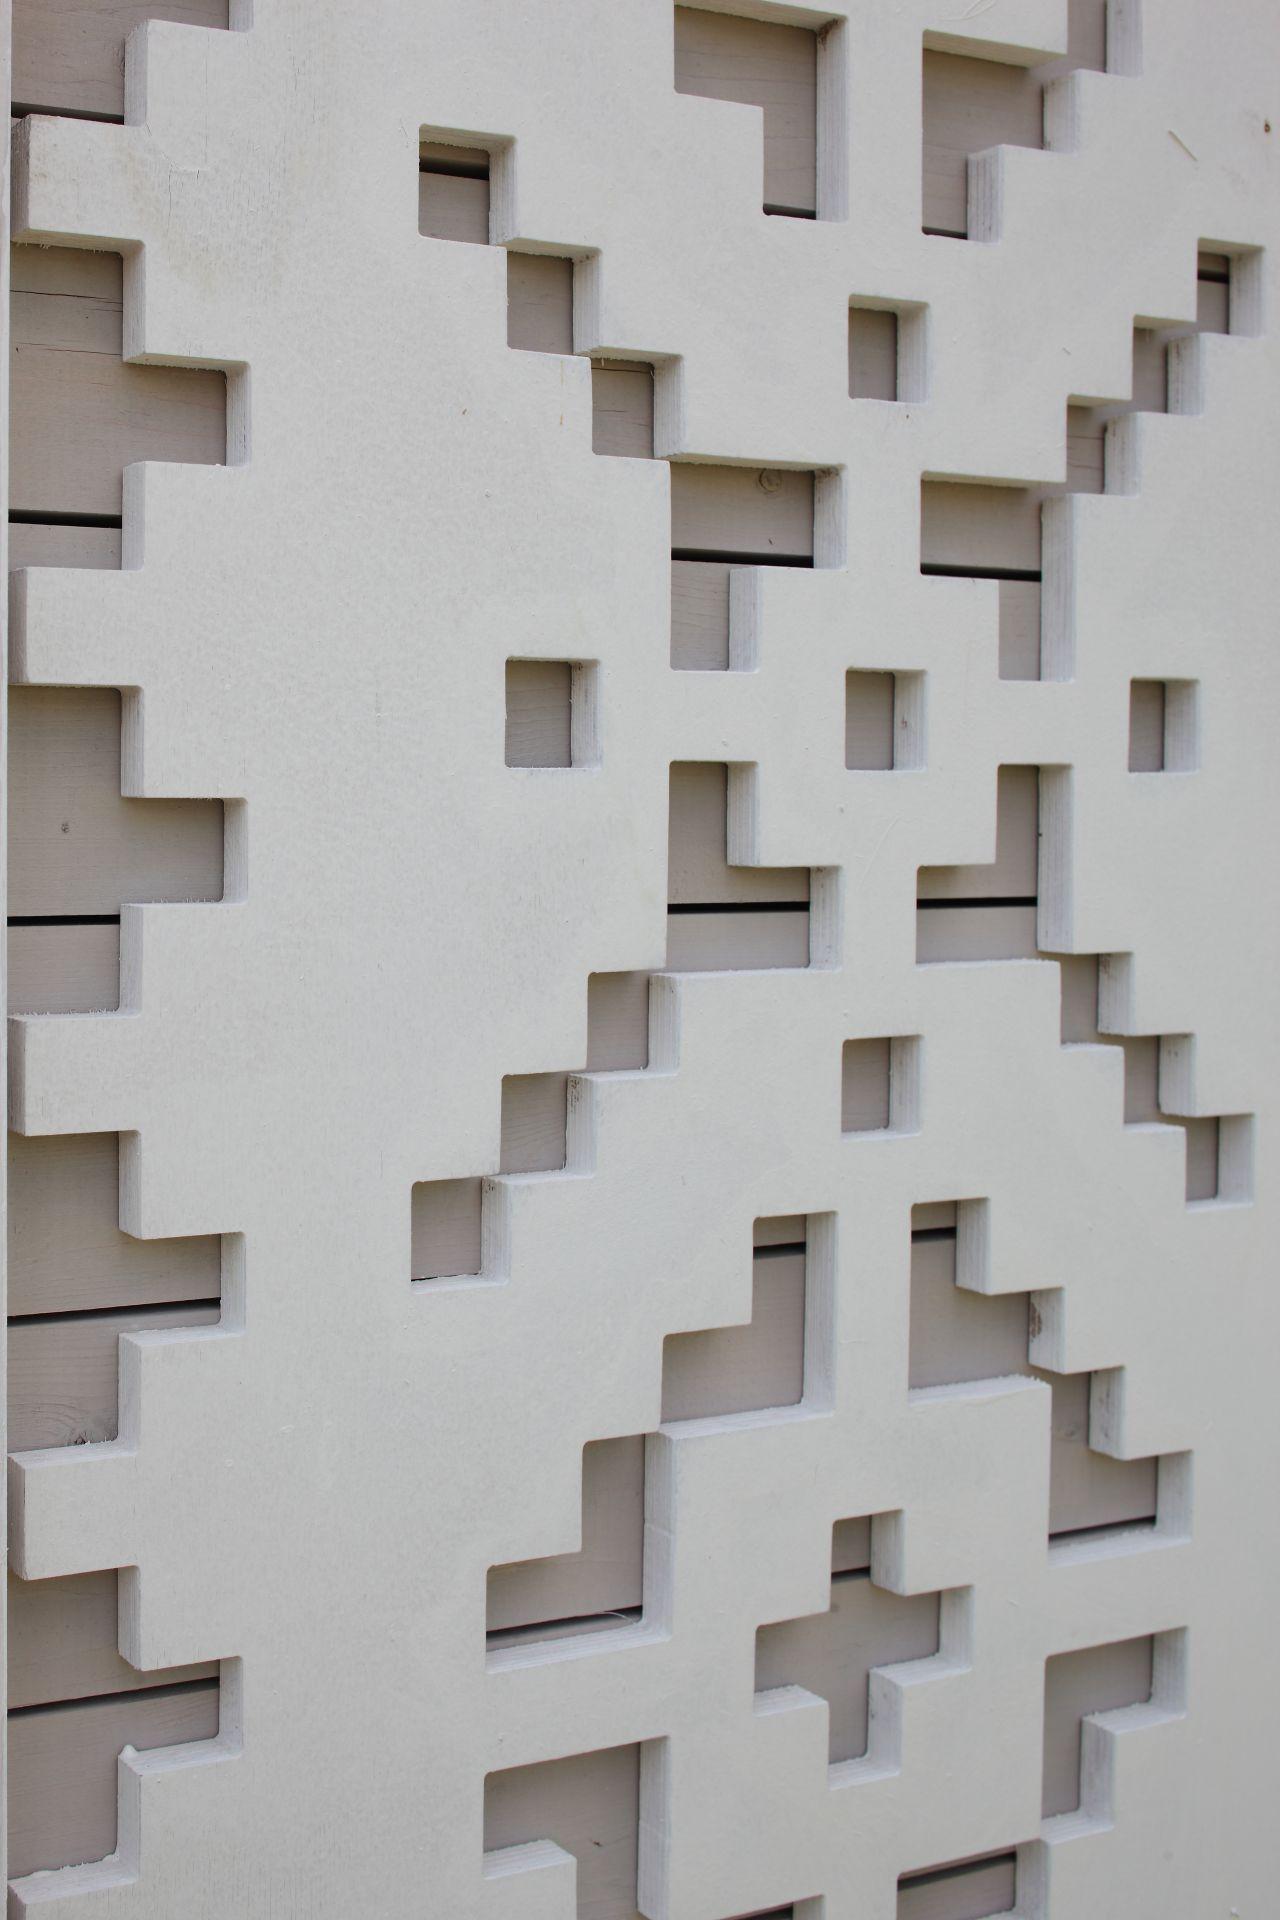 51ef0dfbe8e44ea5b700008e_deco-pattern-house-peter-kostelov_kostelov_deco_pattern_facade_019